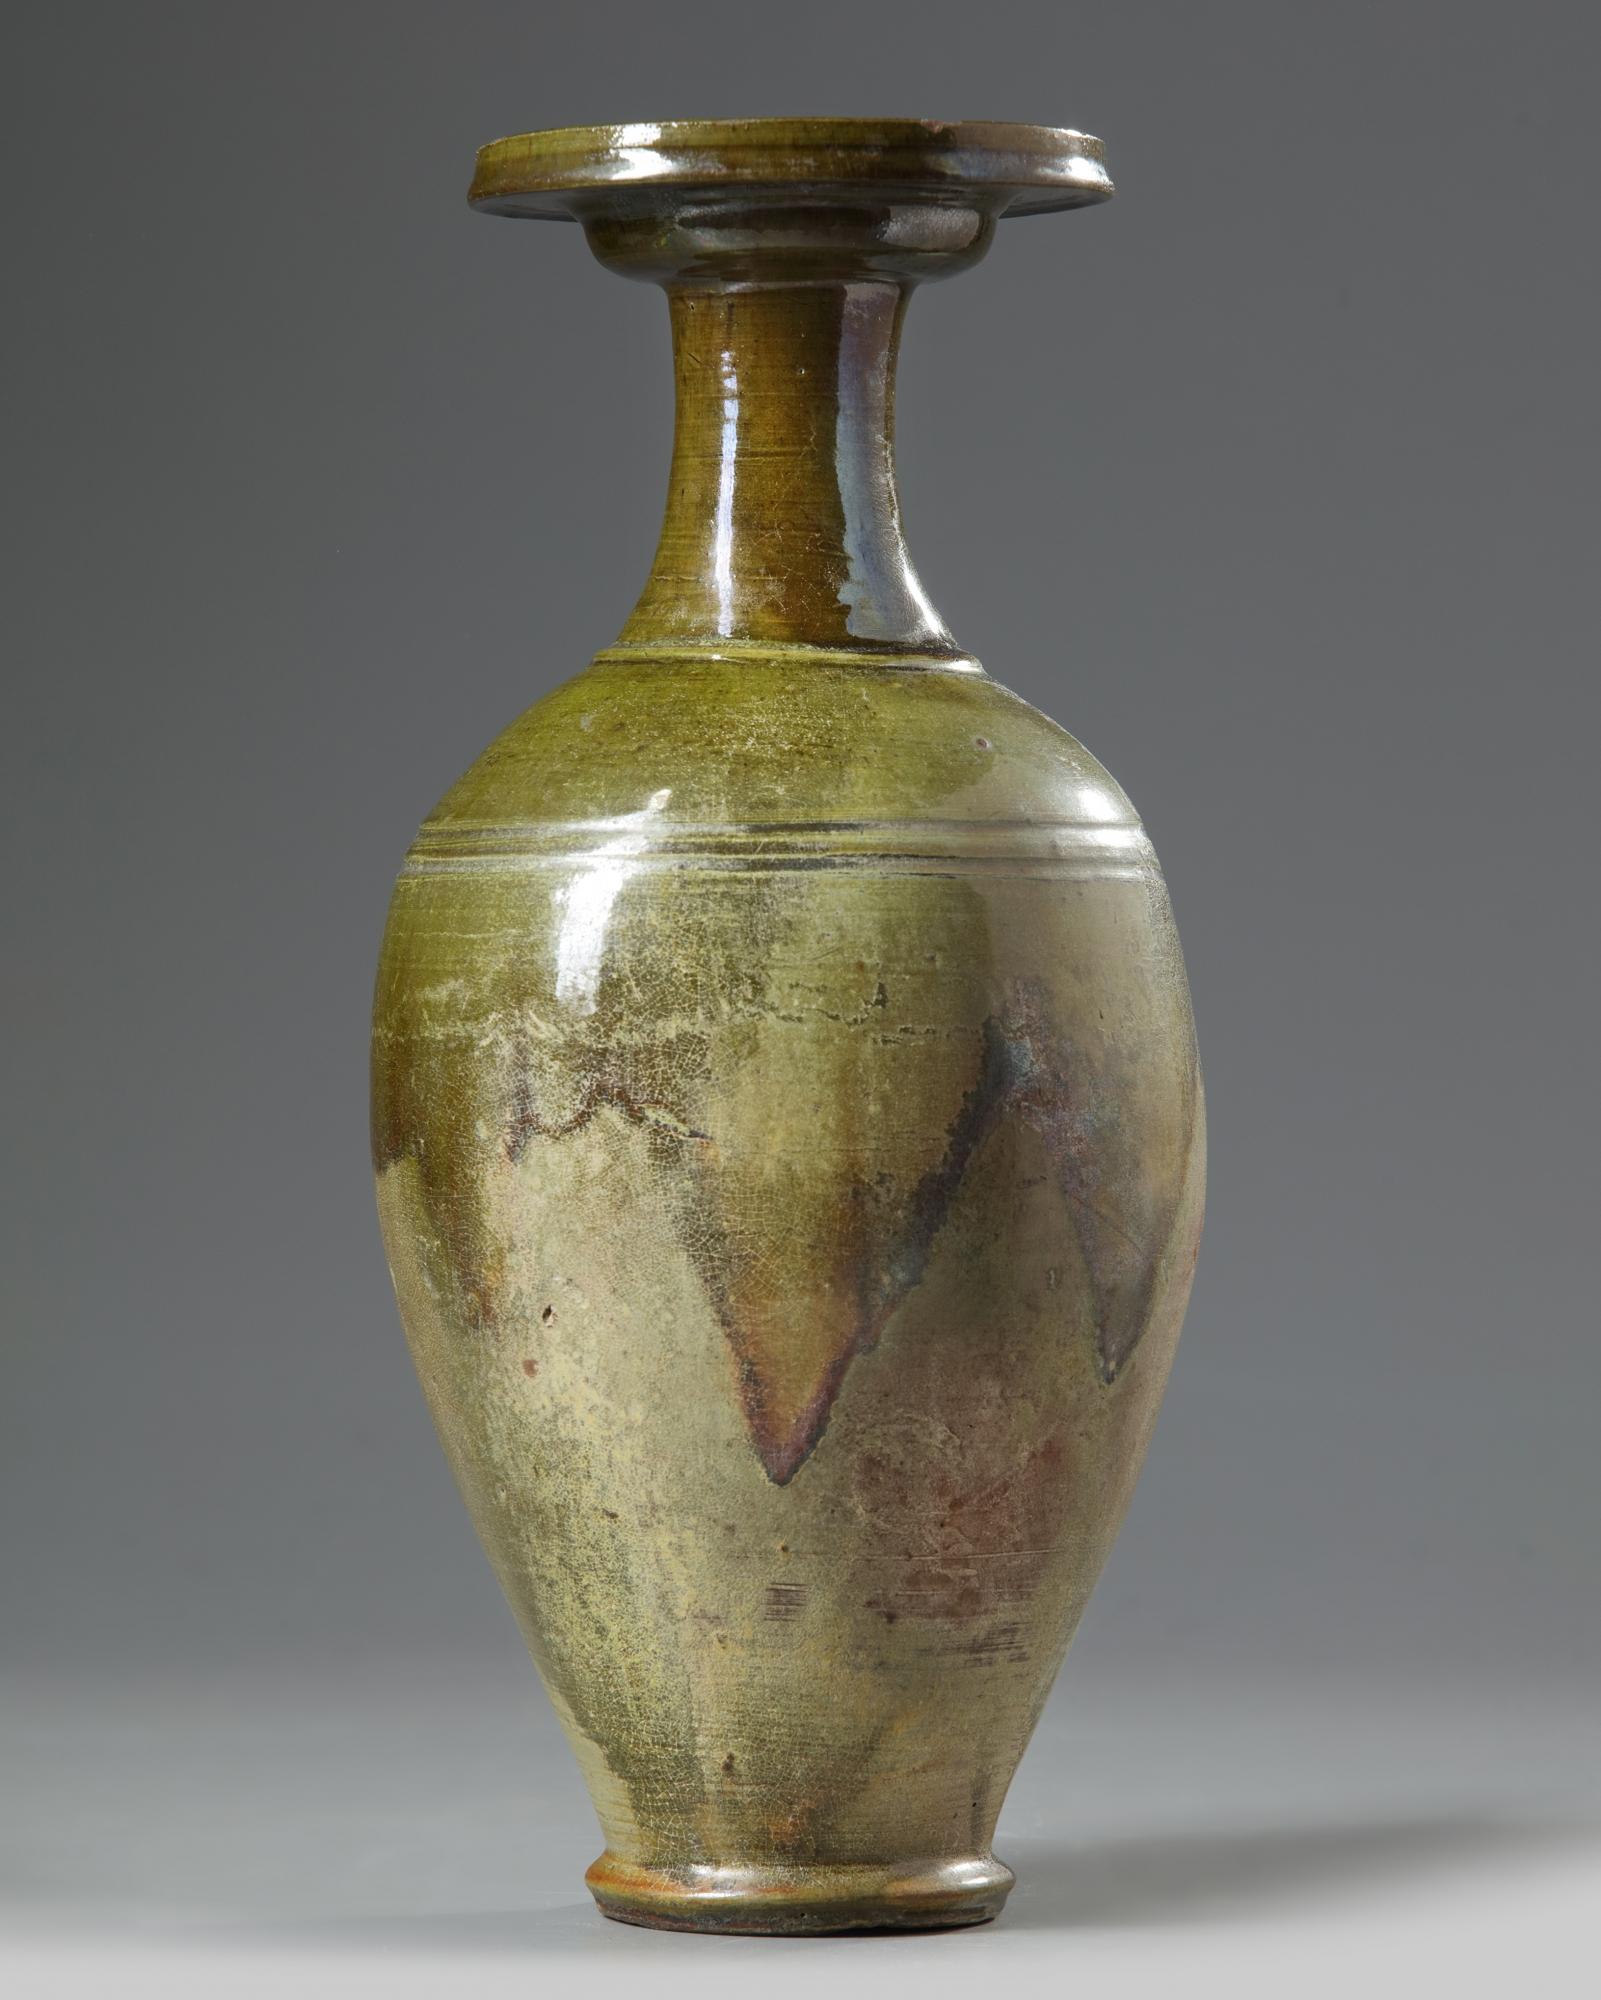 Lot 10 - A Chinese green-glazed pottery vase